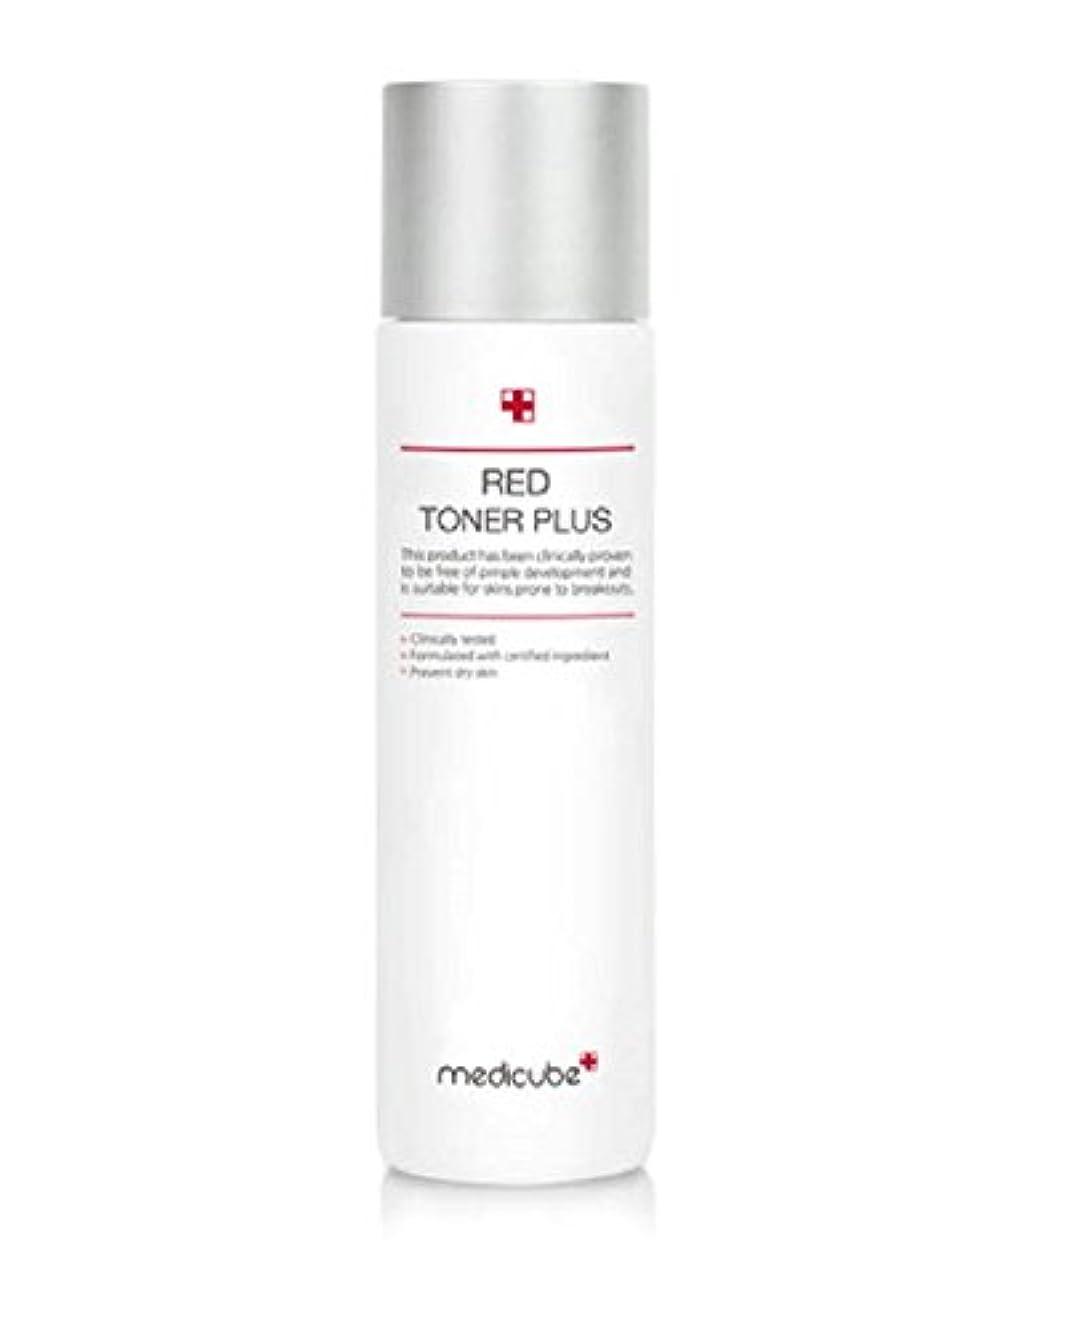 [Medicube] メディキューブ レッド トナー プラス 200m 大容量 Red Toner Plus 200ml /  正品?海外直送商品 [並行輸入品]